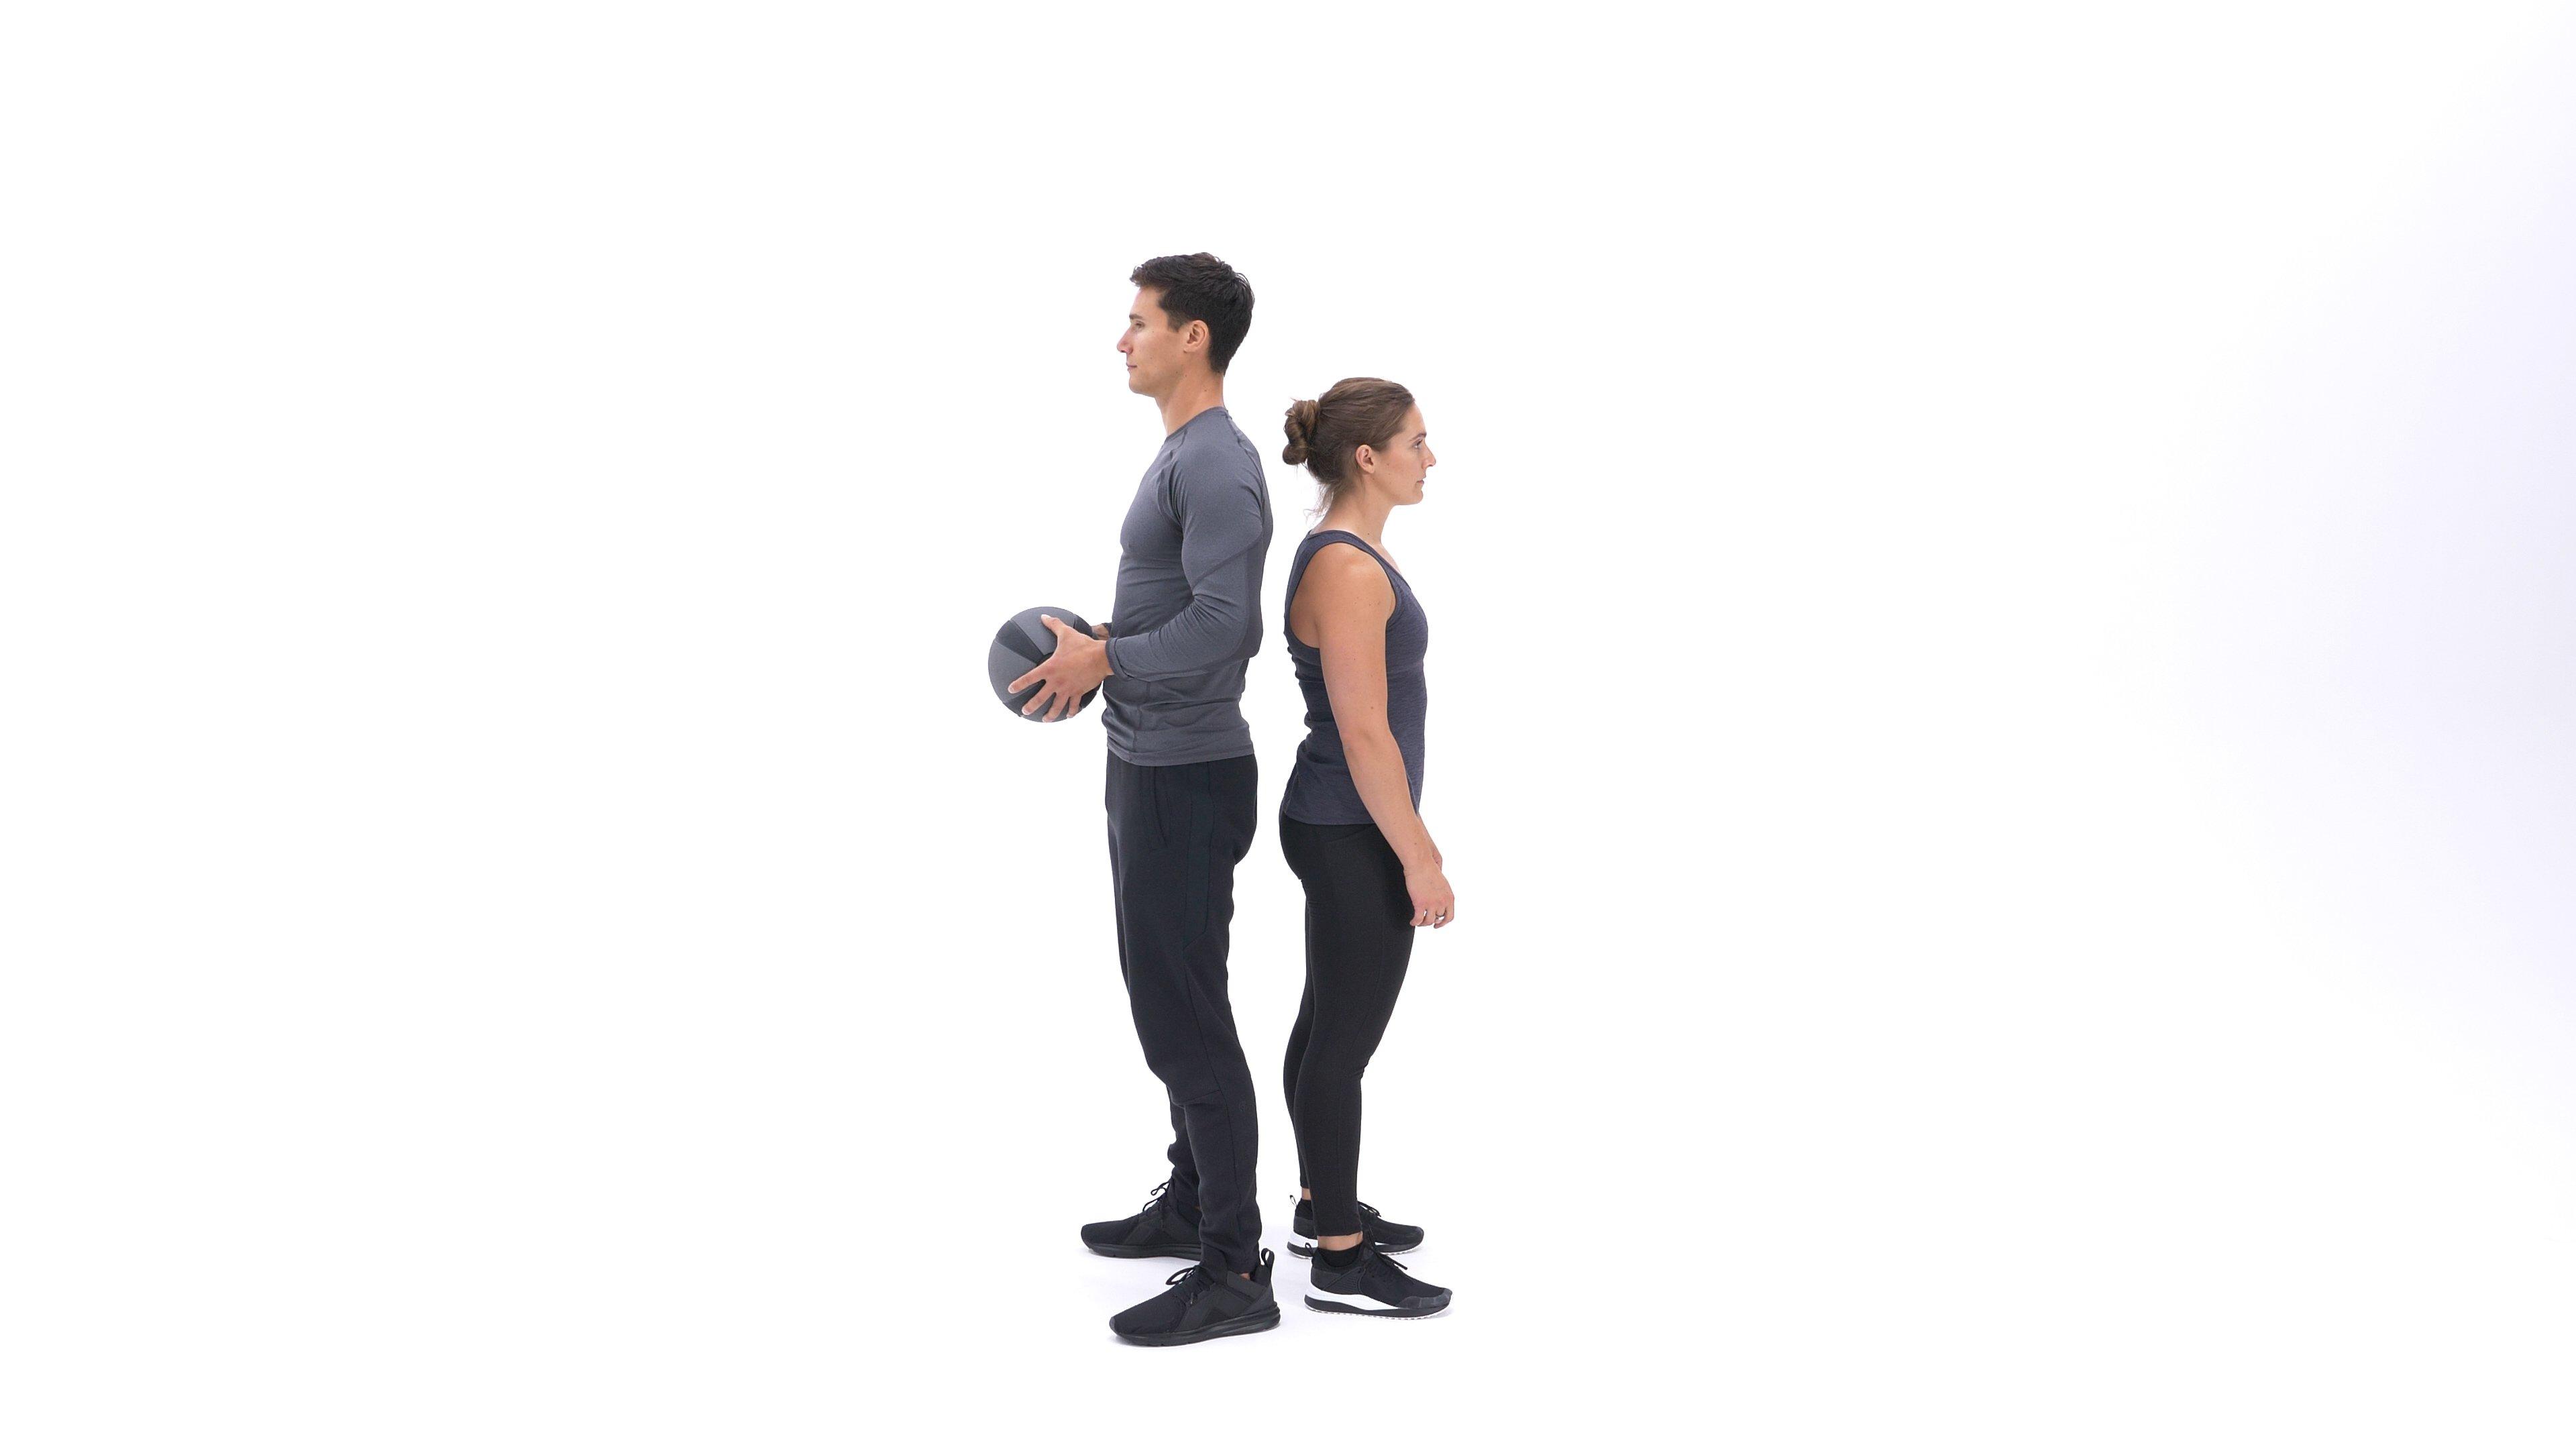 Medicine ball partner twist image